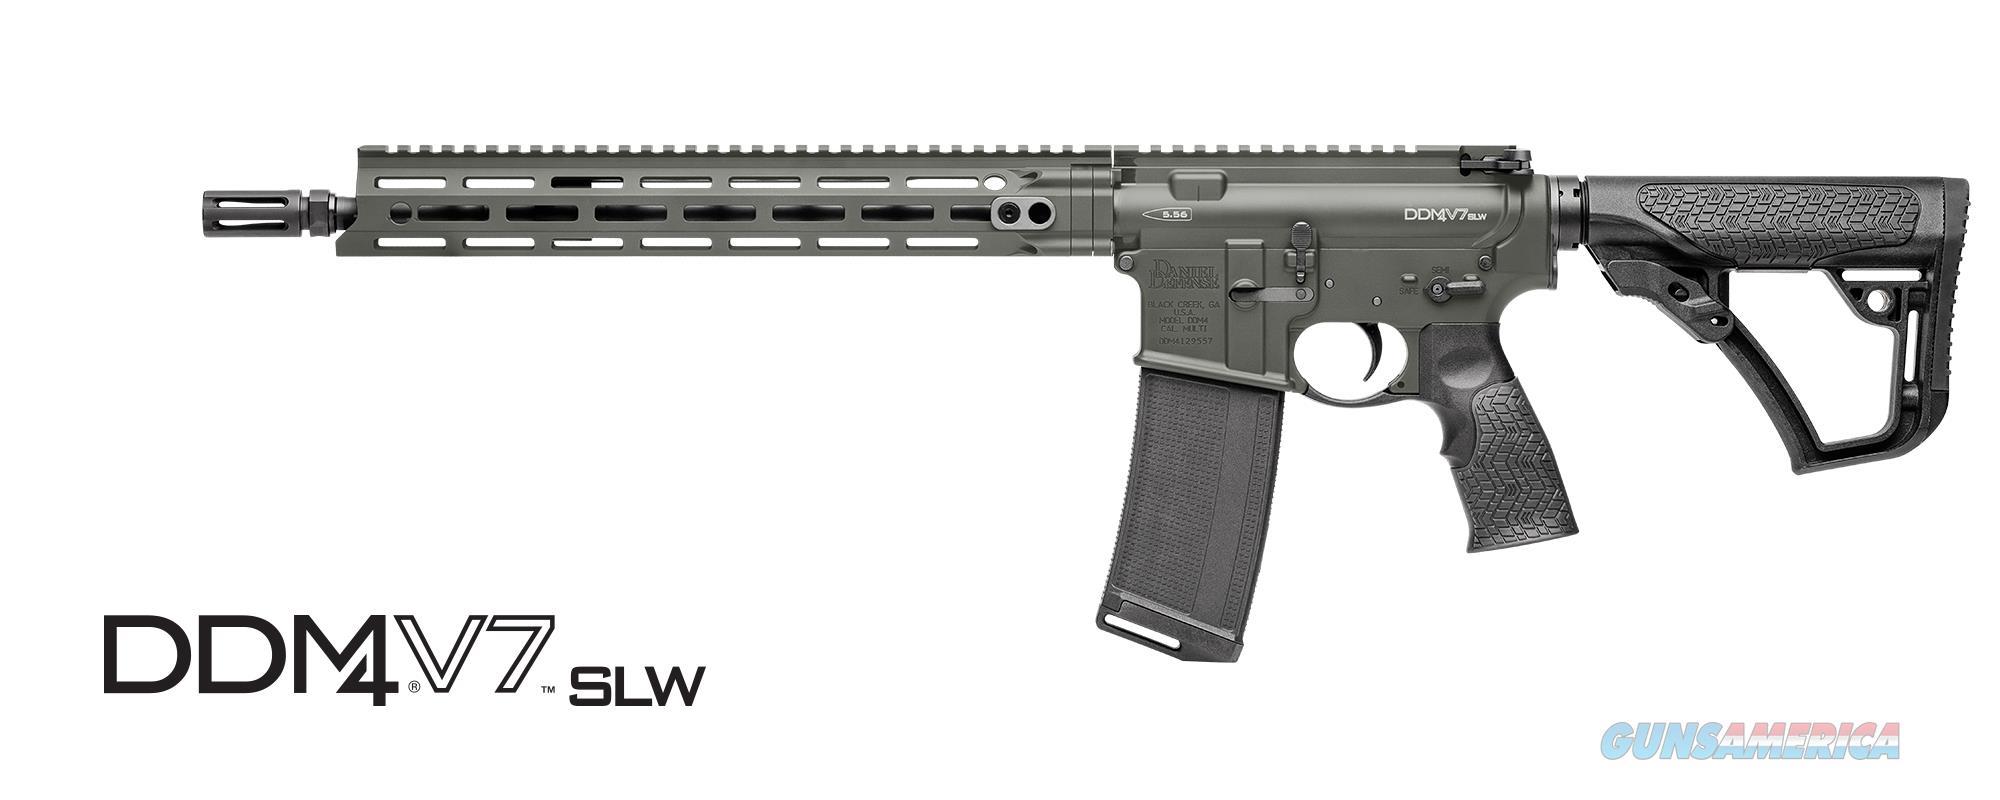 New Model! Daniel Defense V7 SLW in DEEPWOODS Cerakote - IN STOCK NOW!  Guns > Rifles > Daniel Defense > Complete Rifles